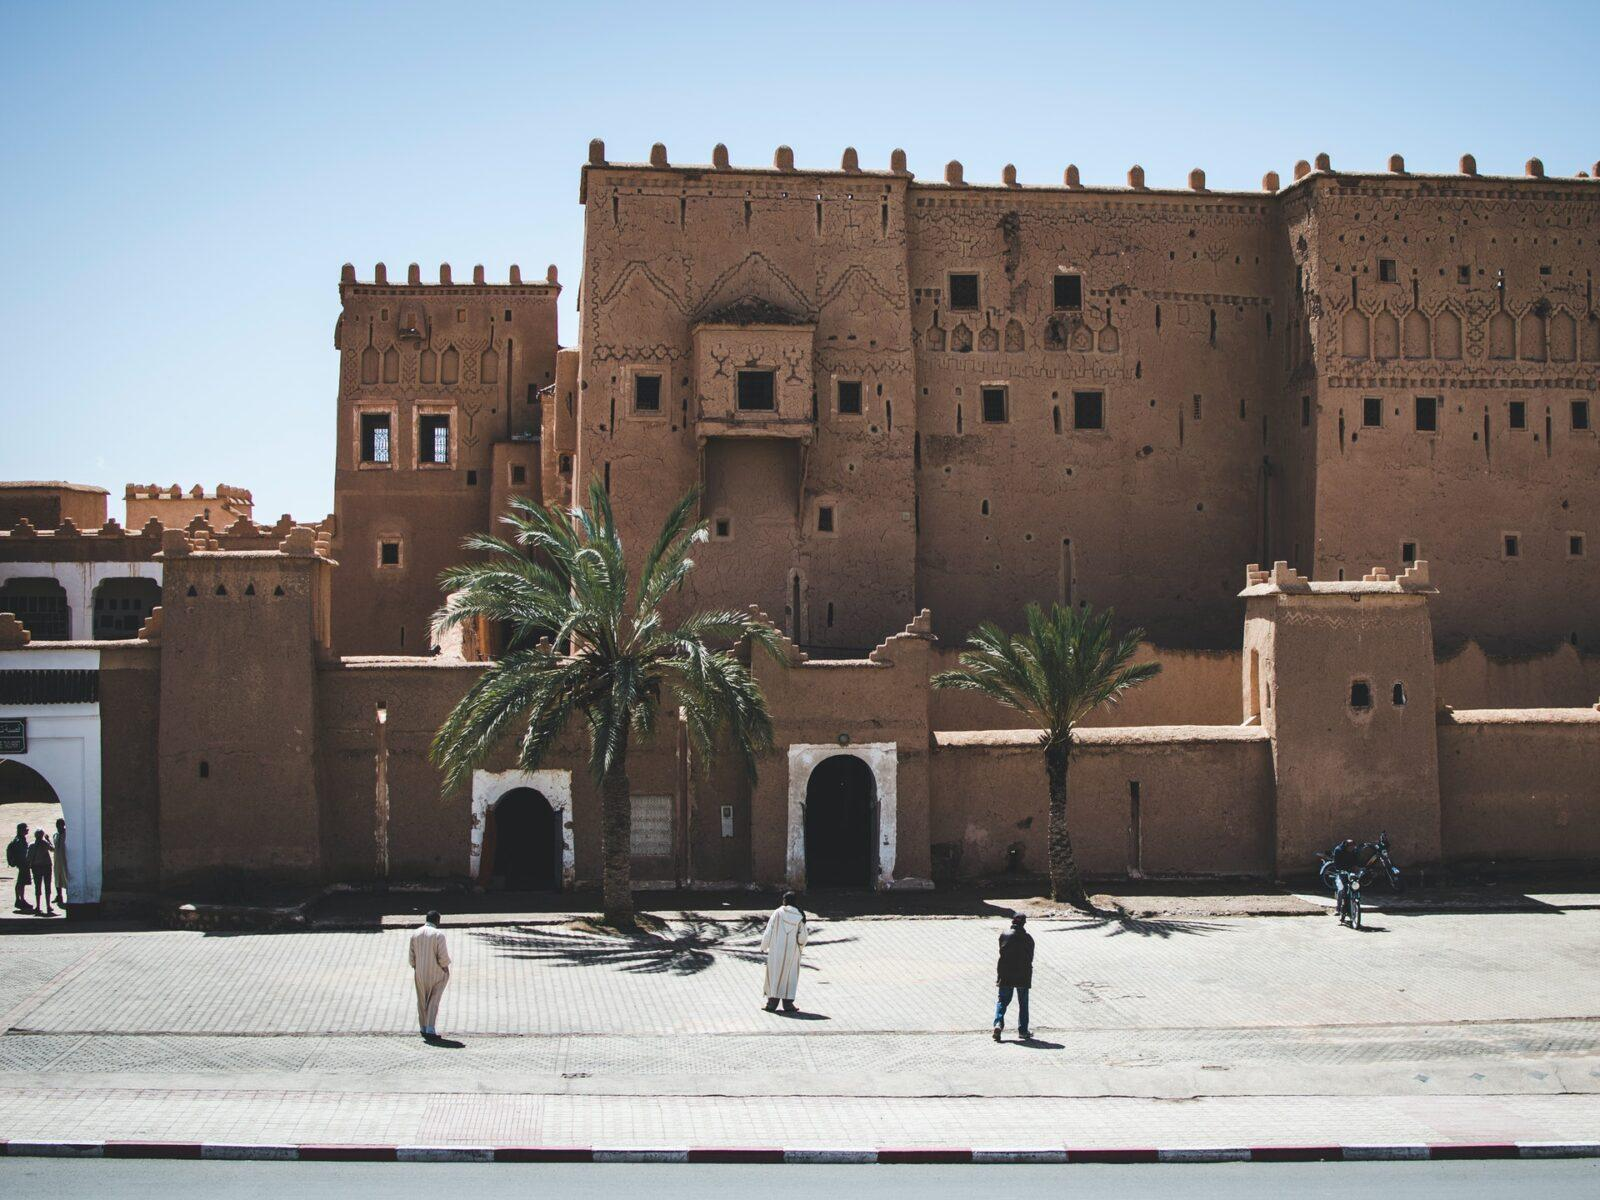 pexels nicolas postiglioni 943510 1 1536x1152 - Guide Morocco Tours